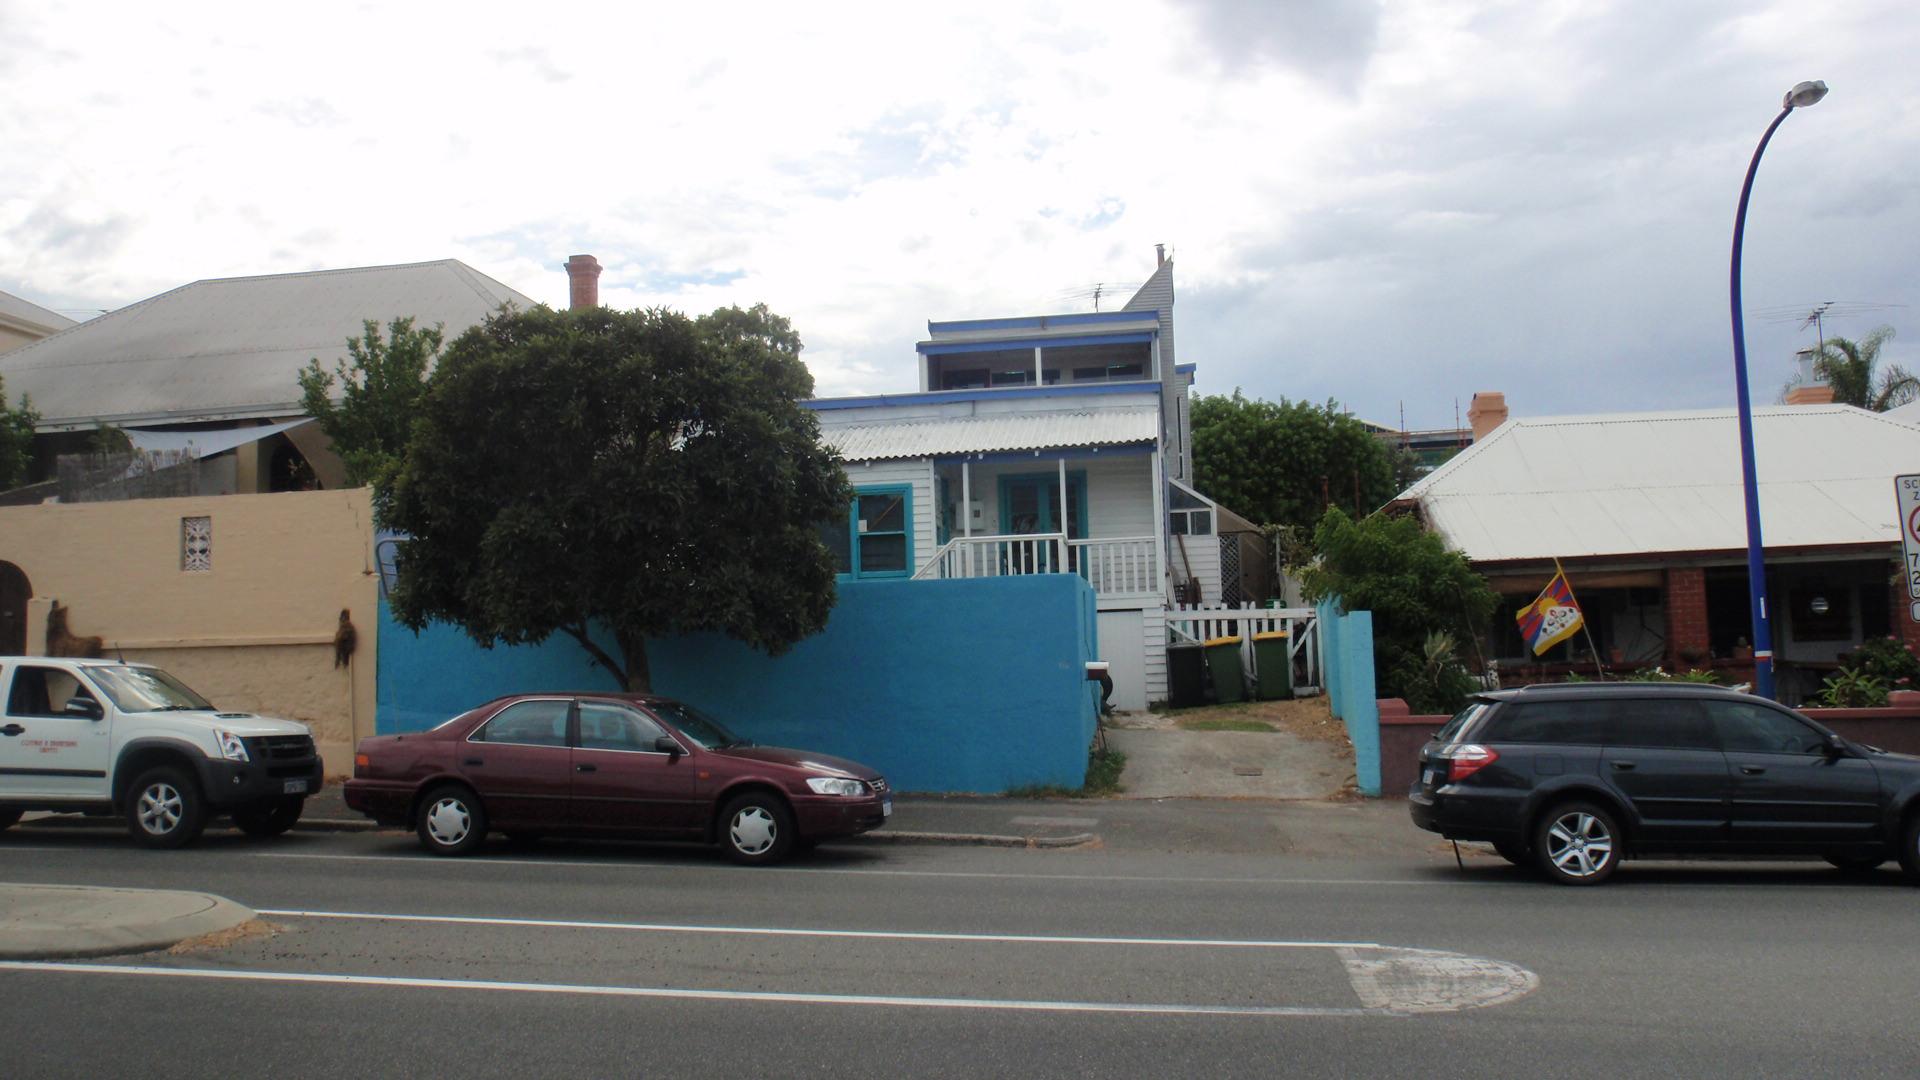 82 East Street 180314 (17).JPG